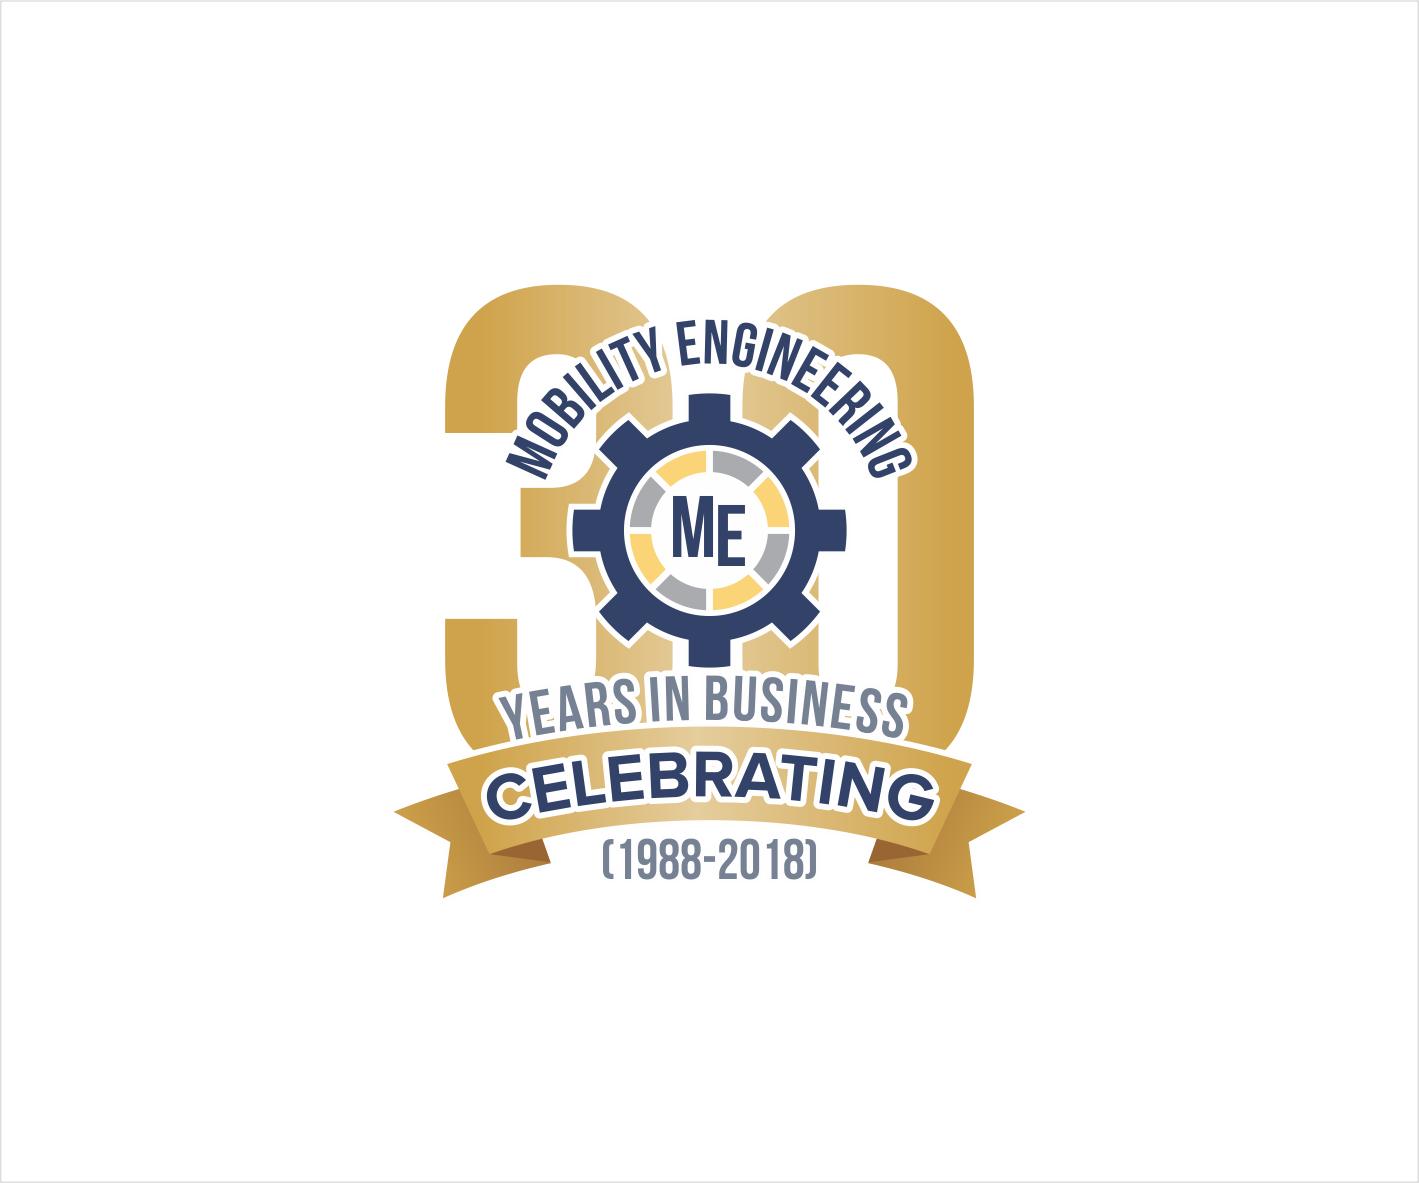 Elegant Playful Business Logo Design For Mobility Engineering In Australia 17502626